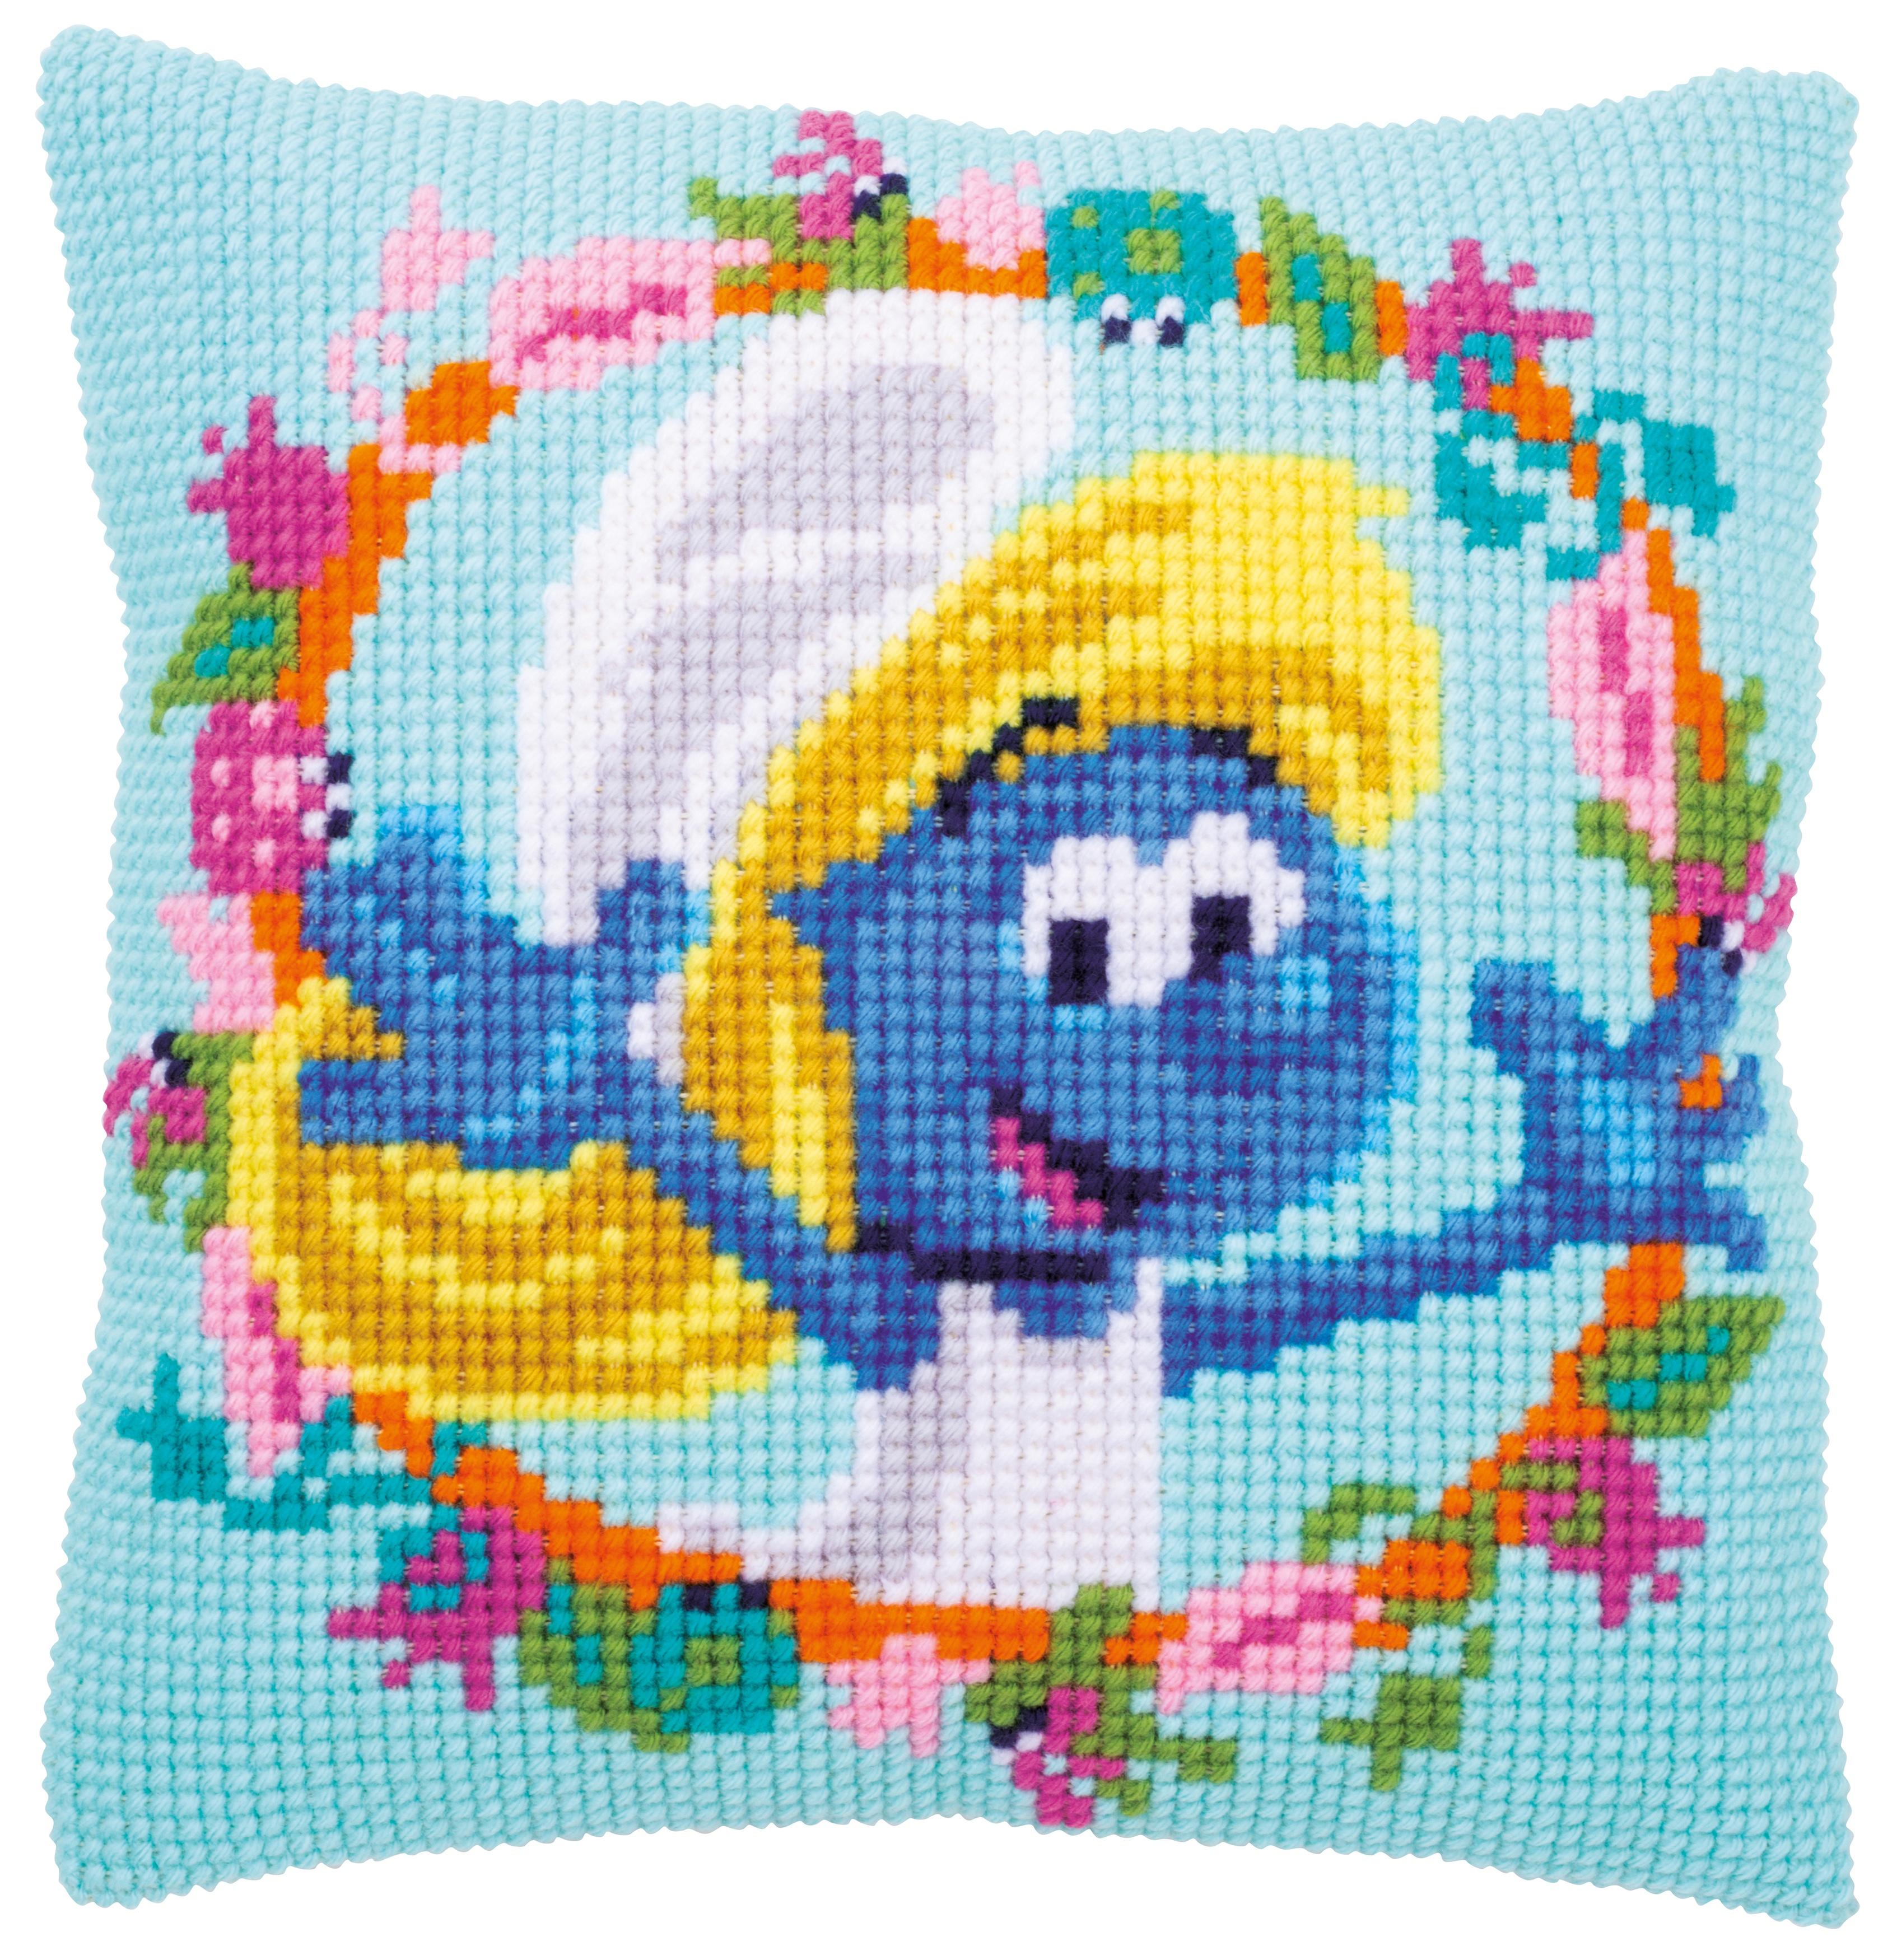 Vervaco Needlepoint Cushion Top Kit 16X16-The Smurfs Smurfette